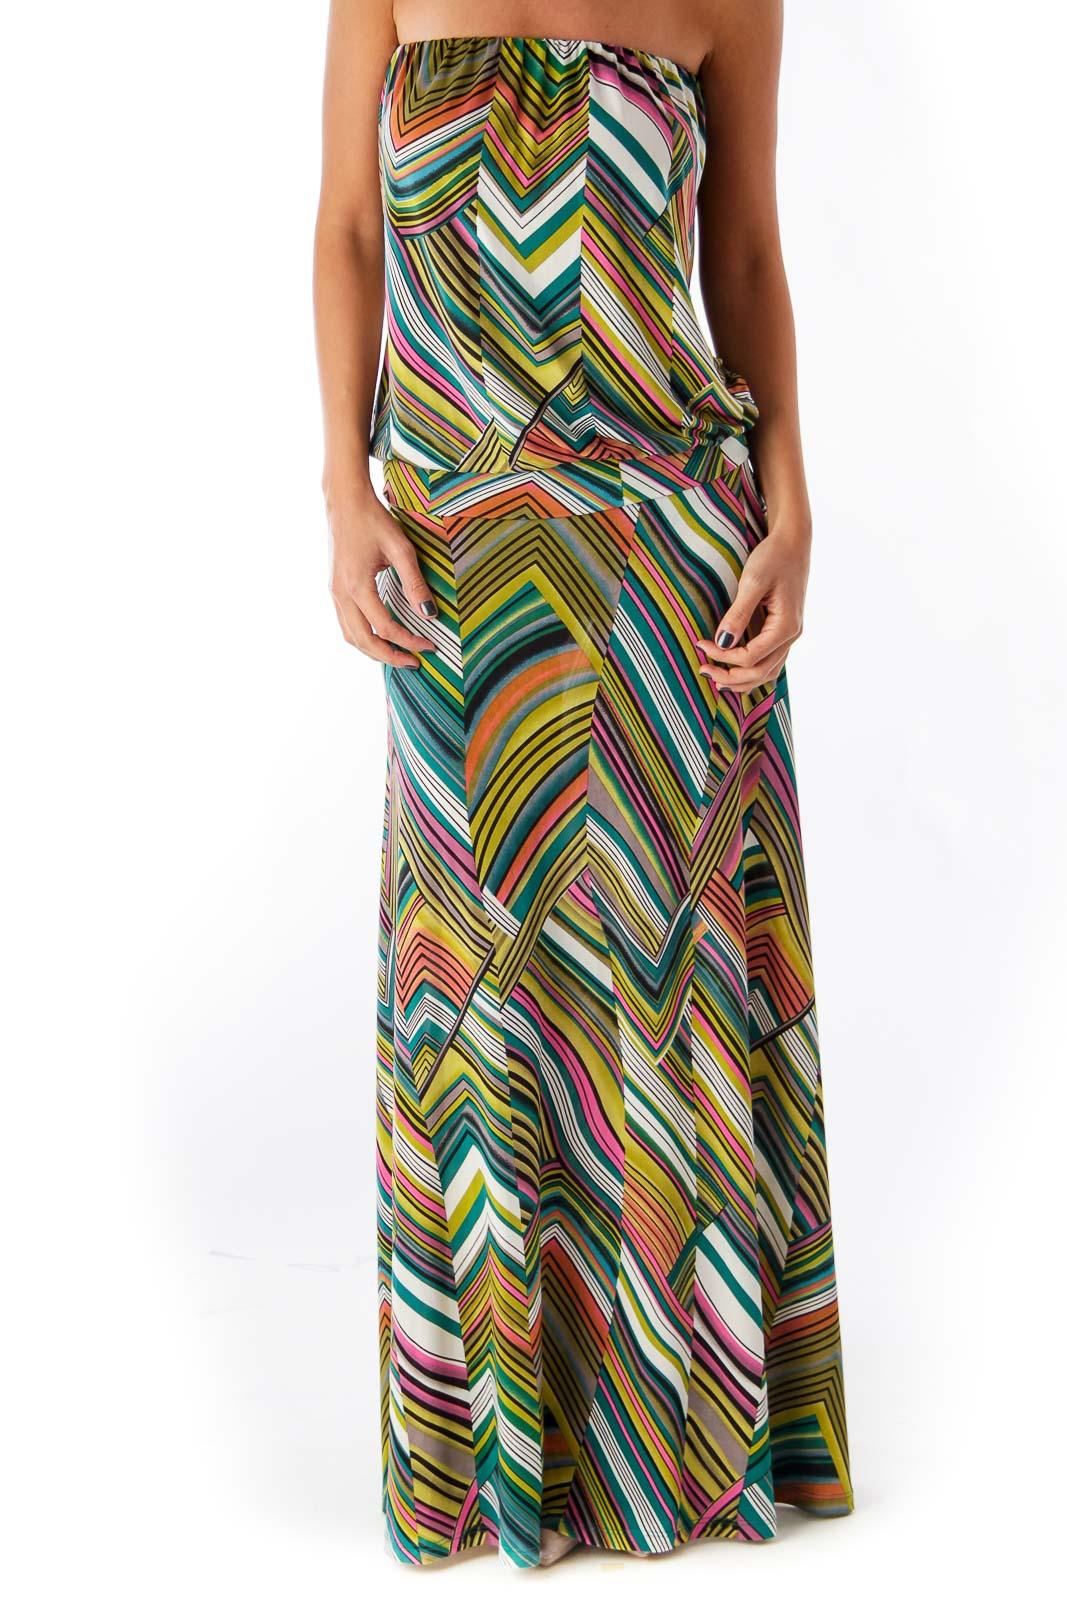 Print Chevron Long Strapless Dress Front